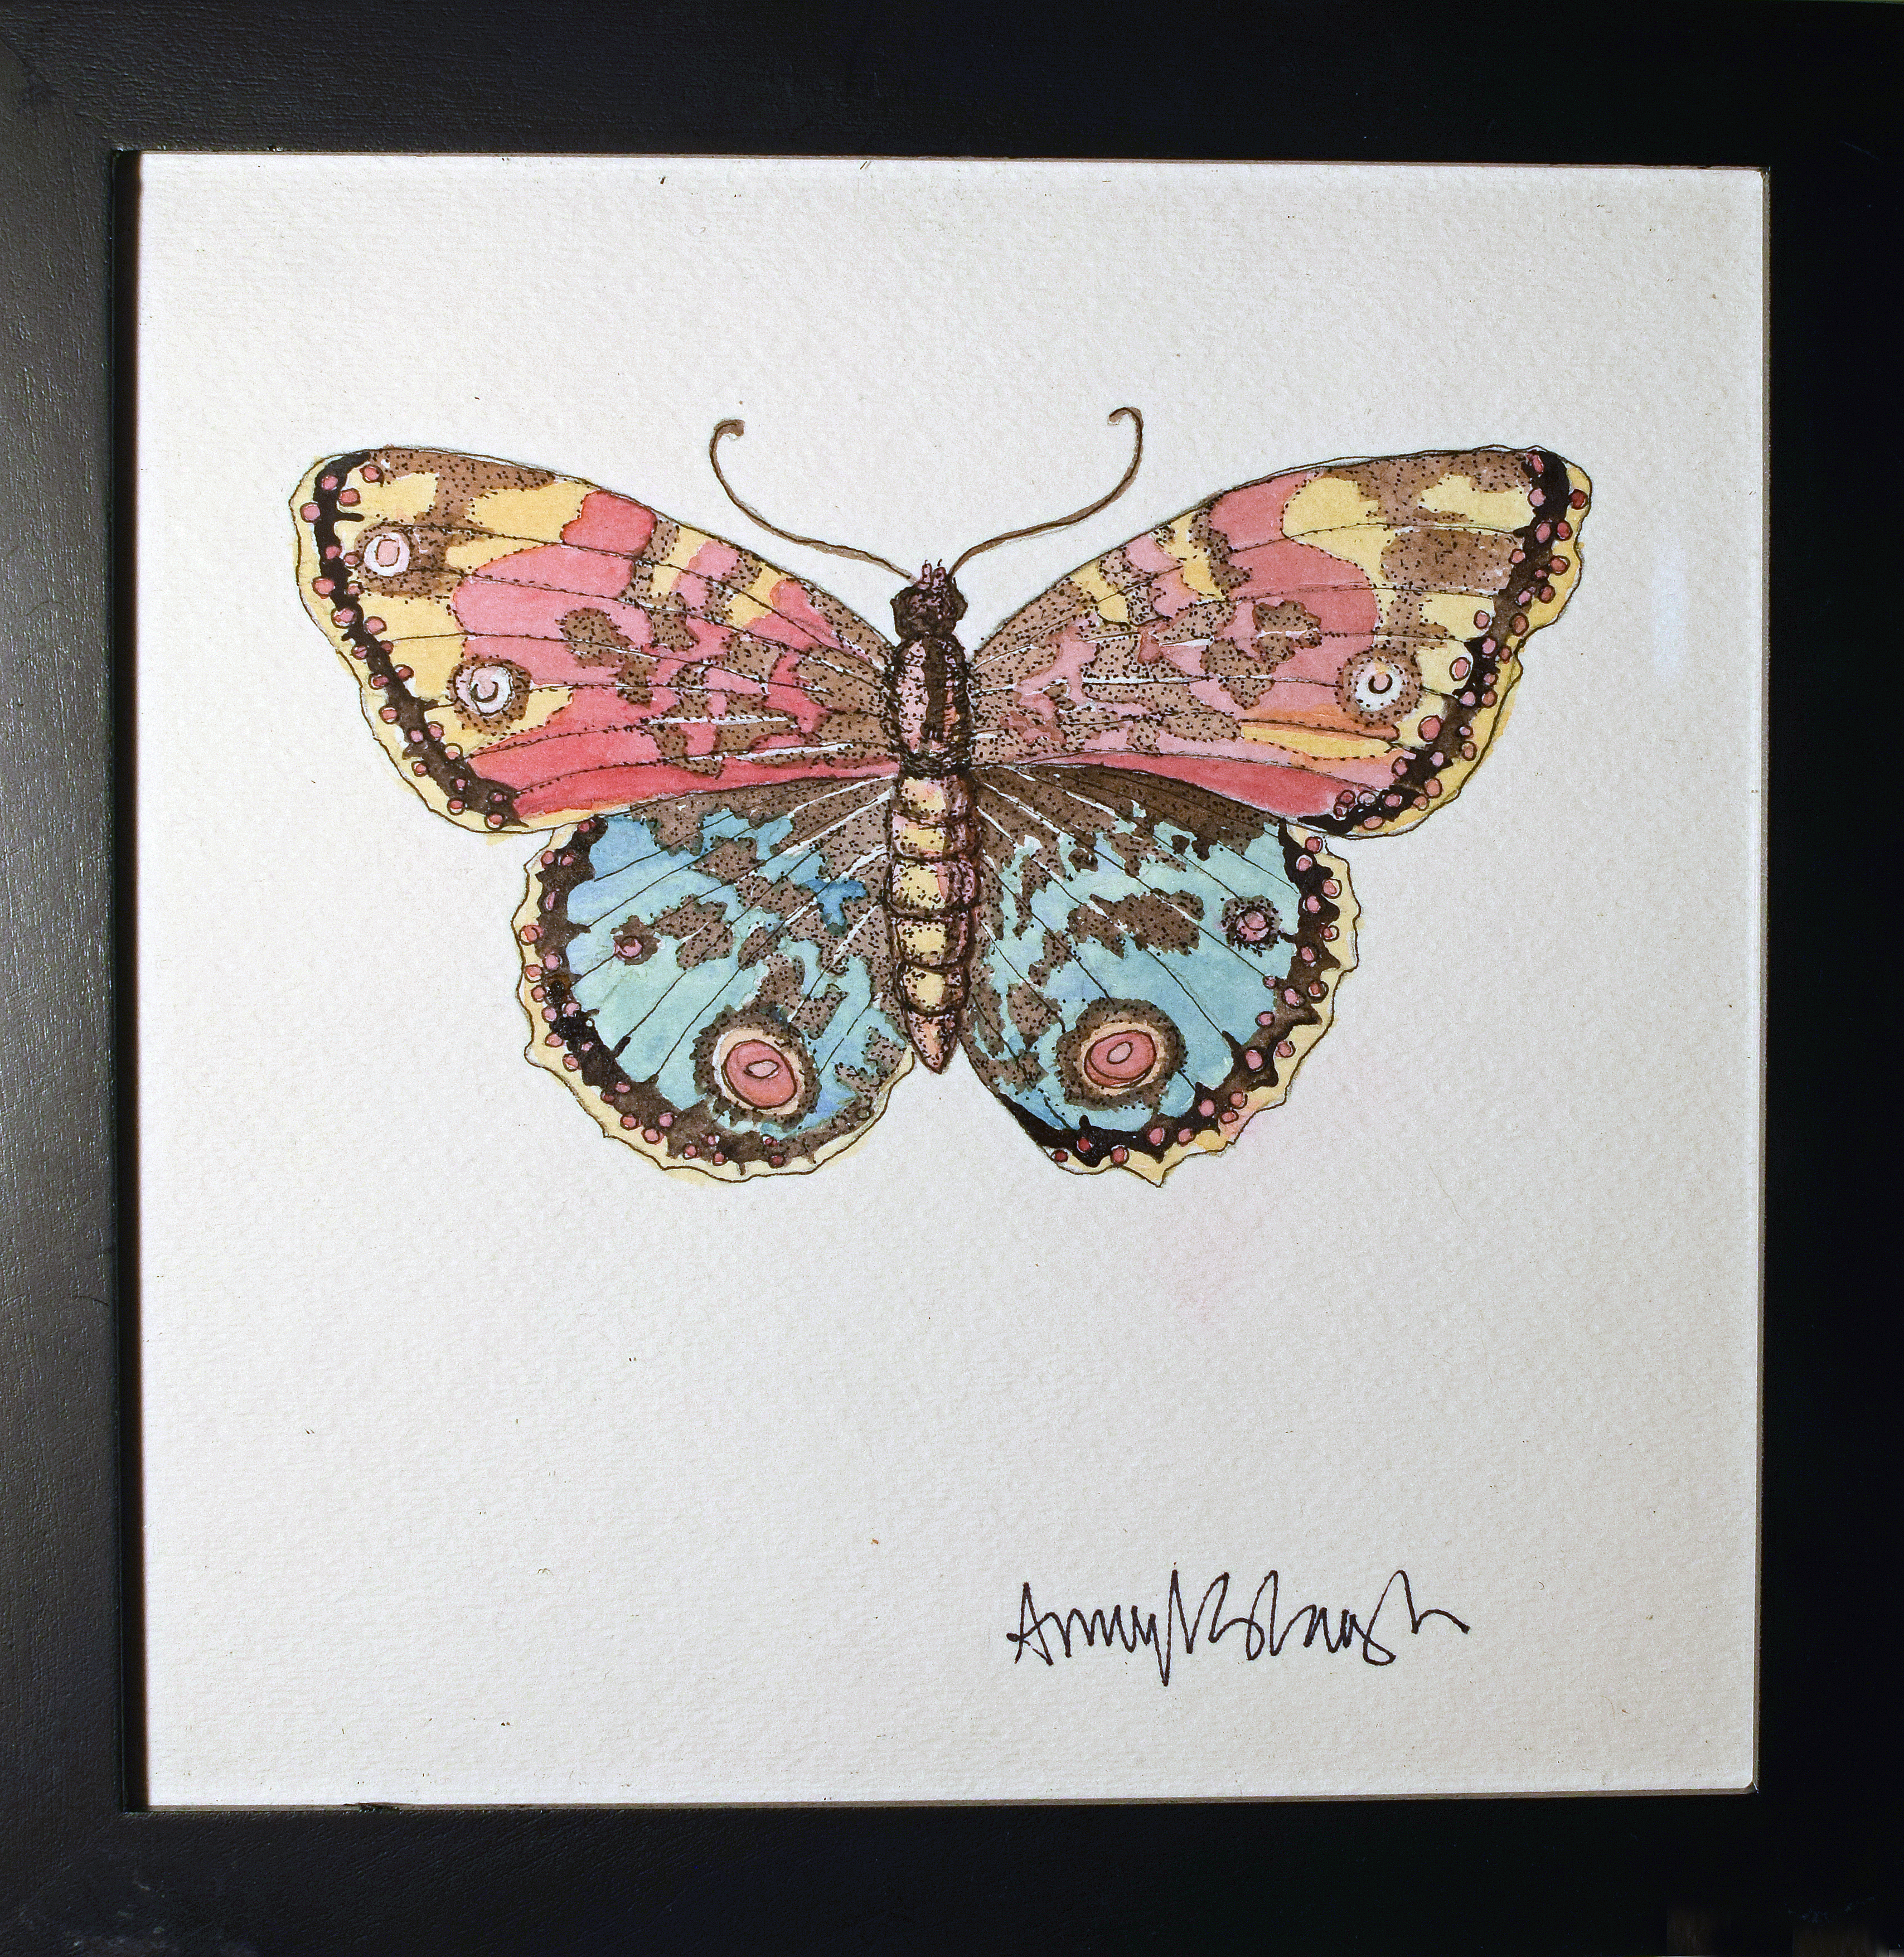 Eygptian Moth